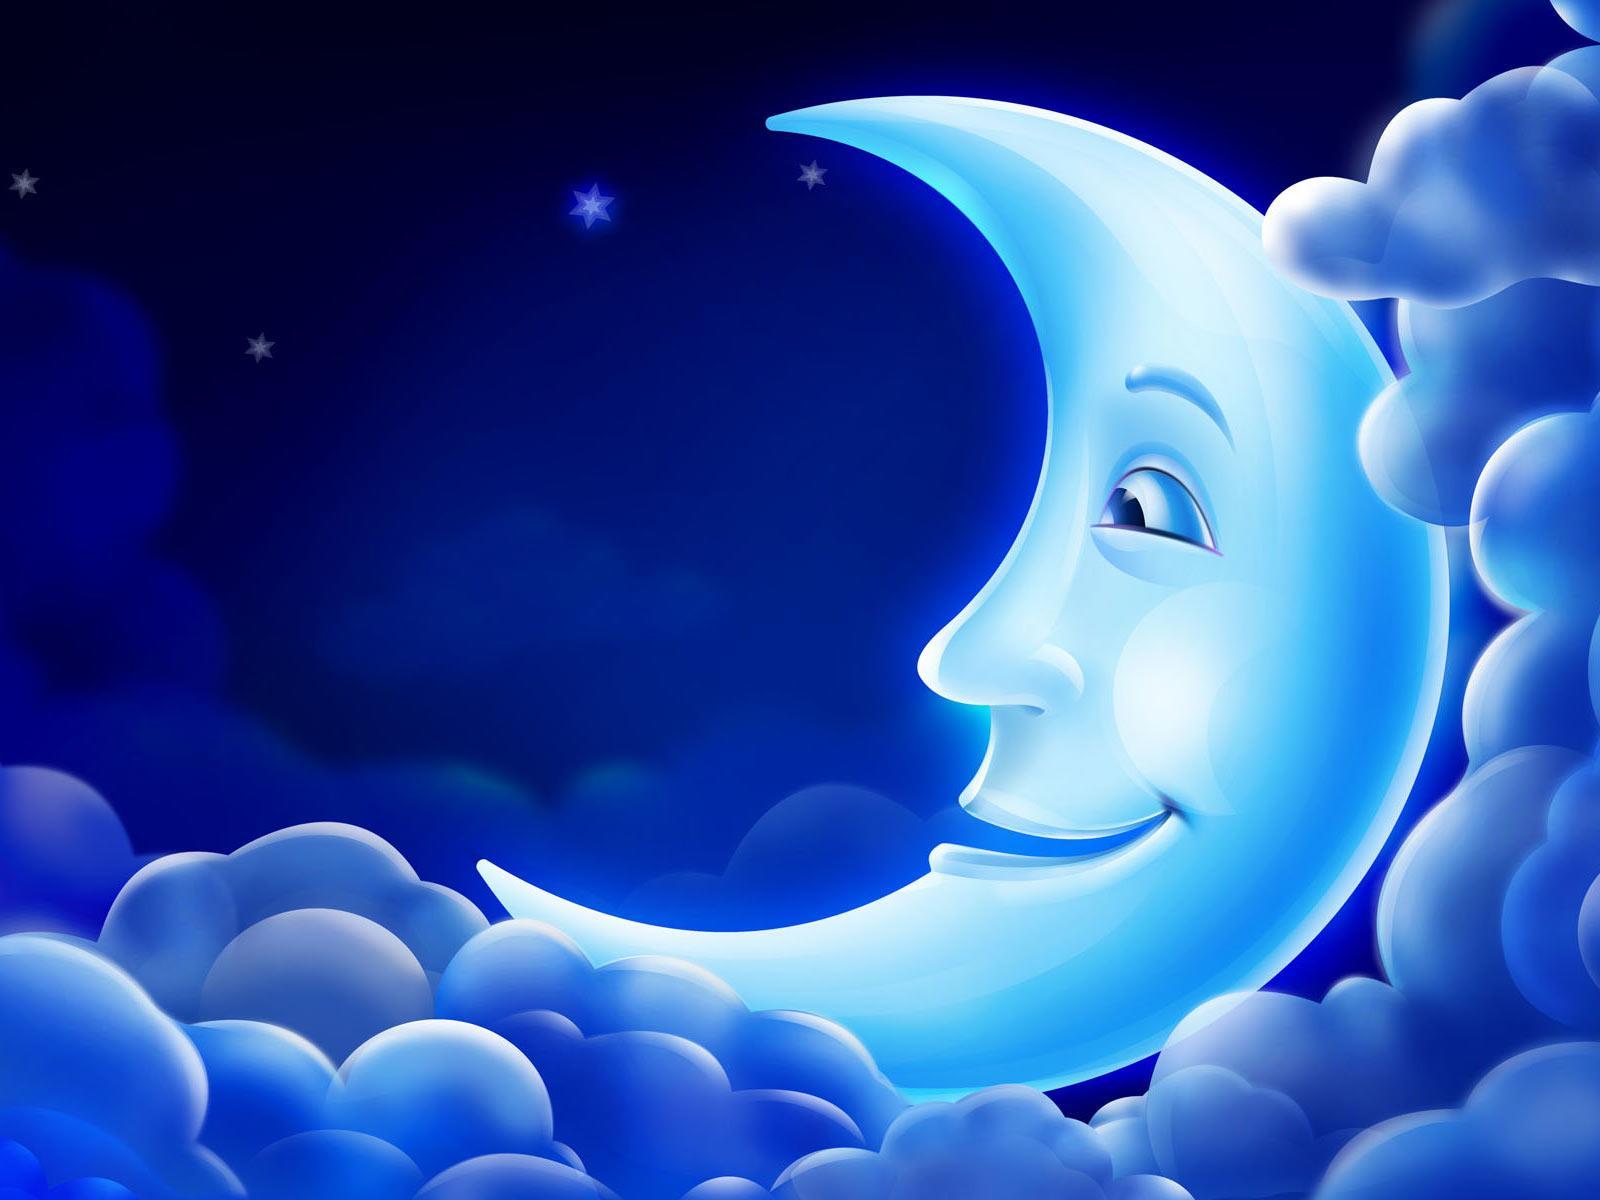 Blue Moon Photo